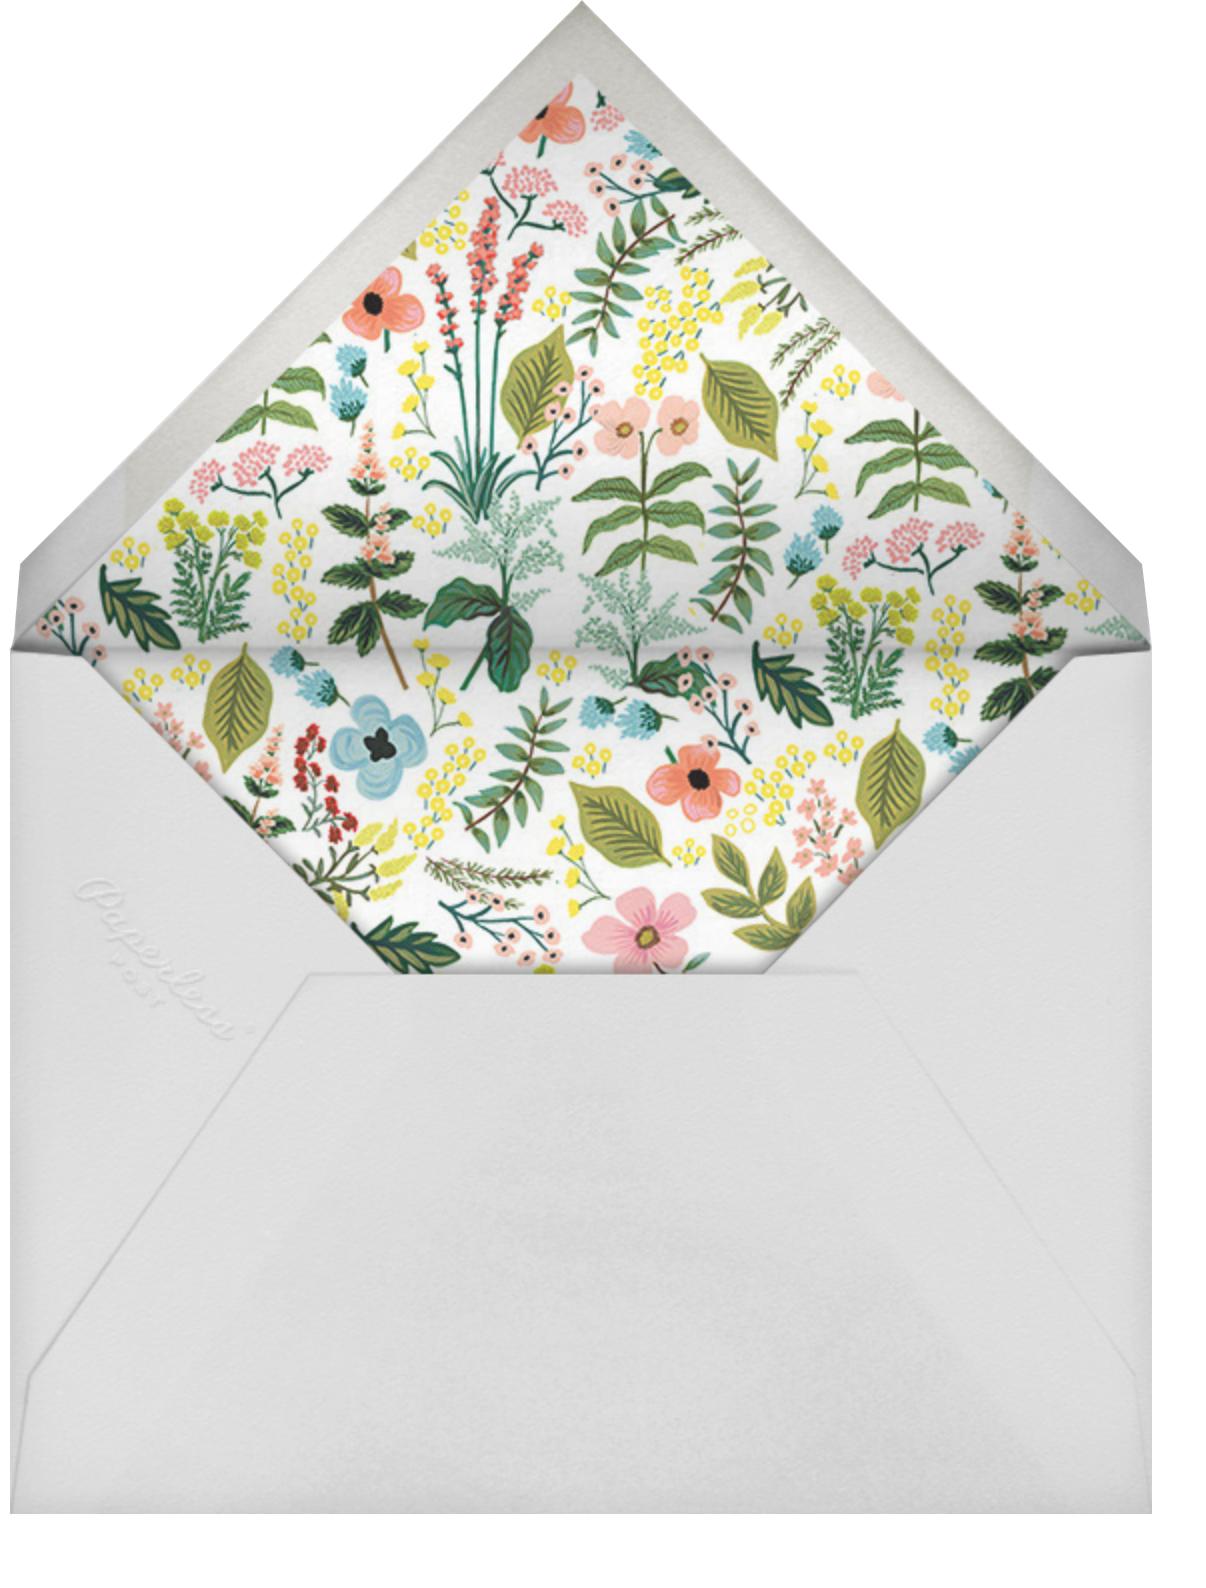 Spring Gathering (Invitation) - Meringue - Rifle Paper Co. - All - envelope back